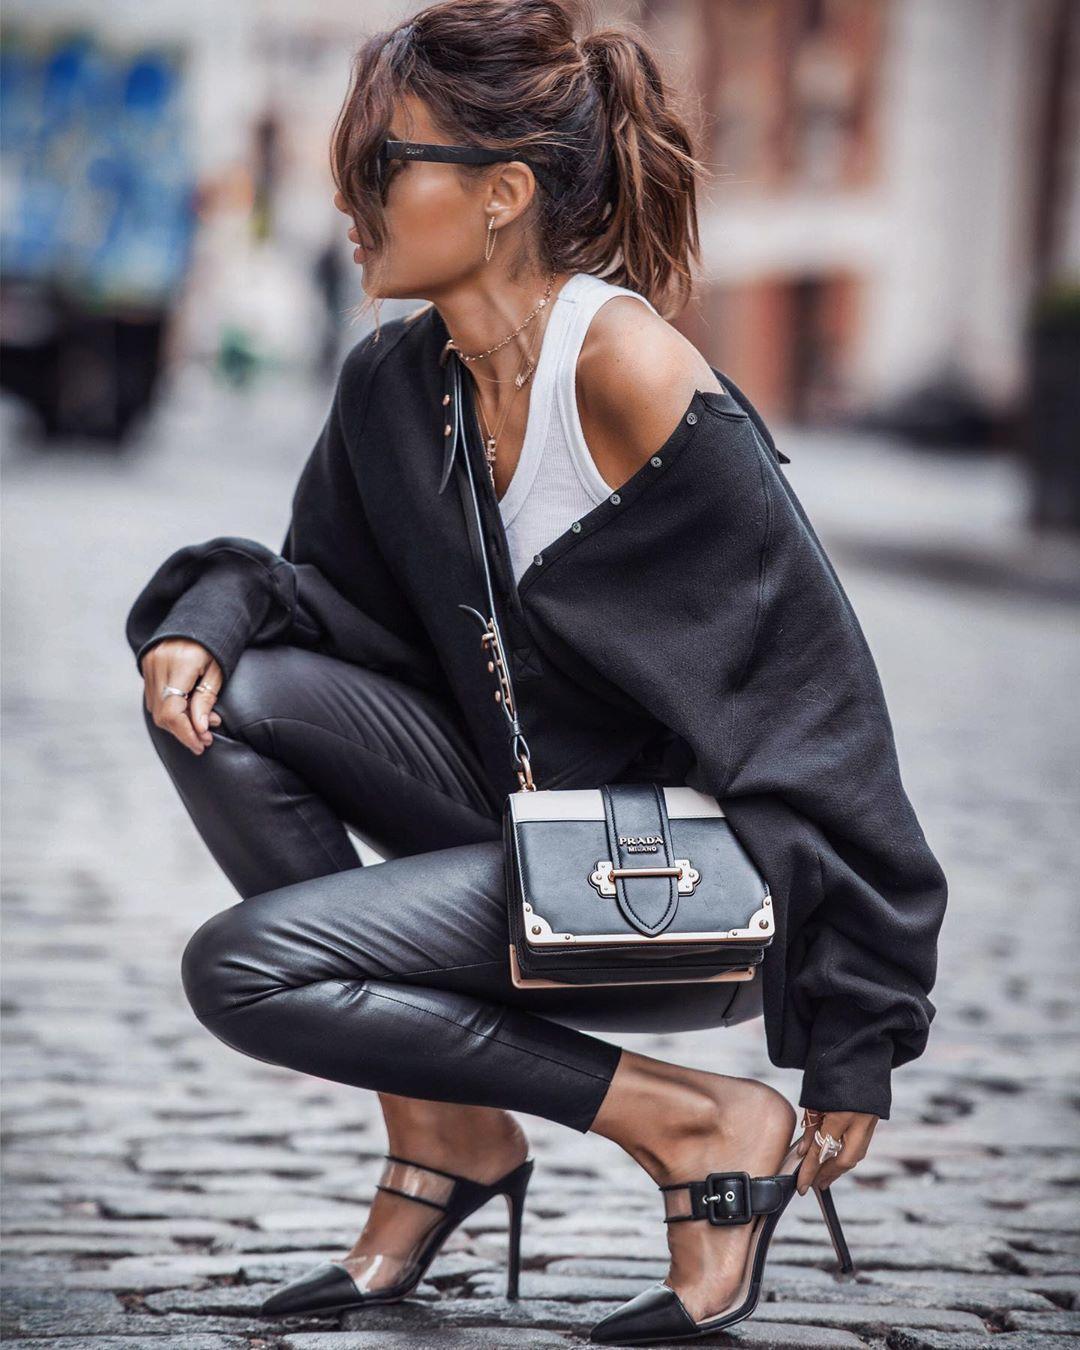 "Erica Hoida • Fashioned|Chic on Instagram: ""Sweatshirts + Stilettos ⚡️ Elevating casual style."